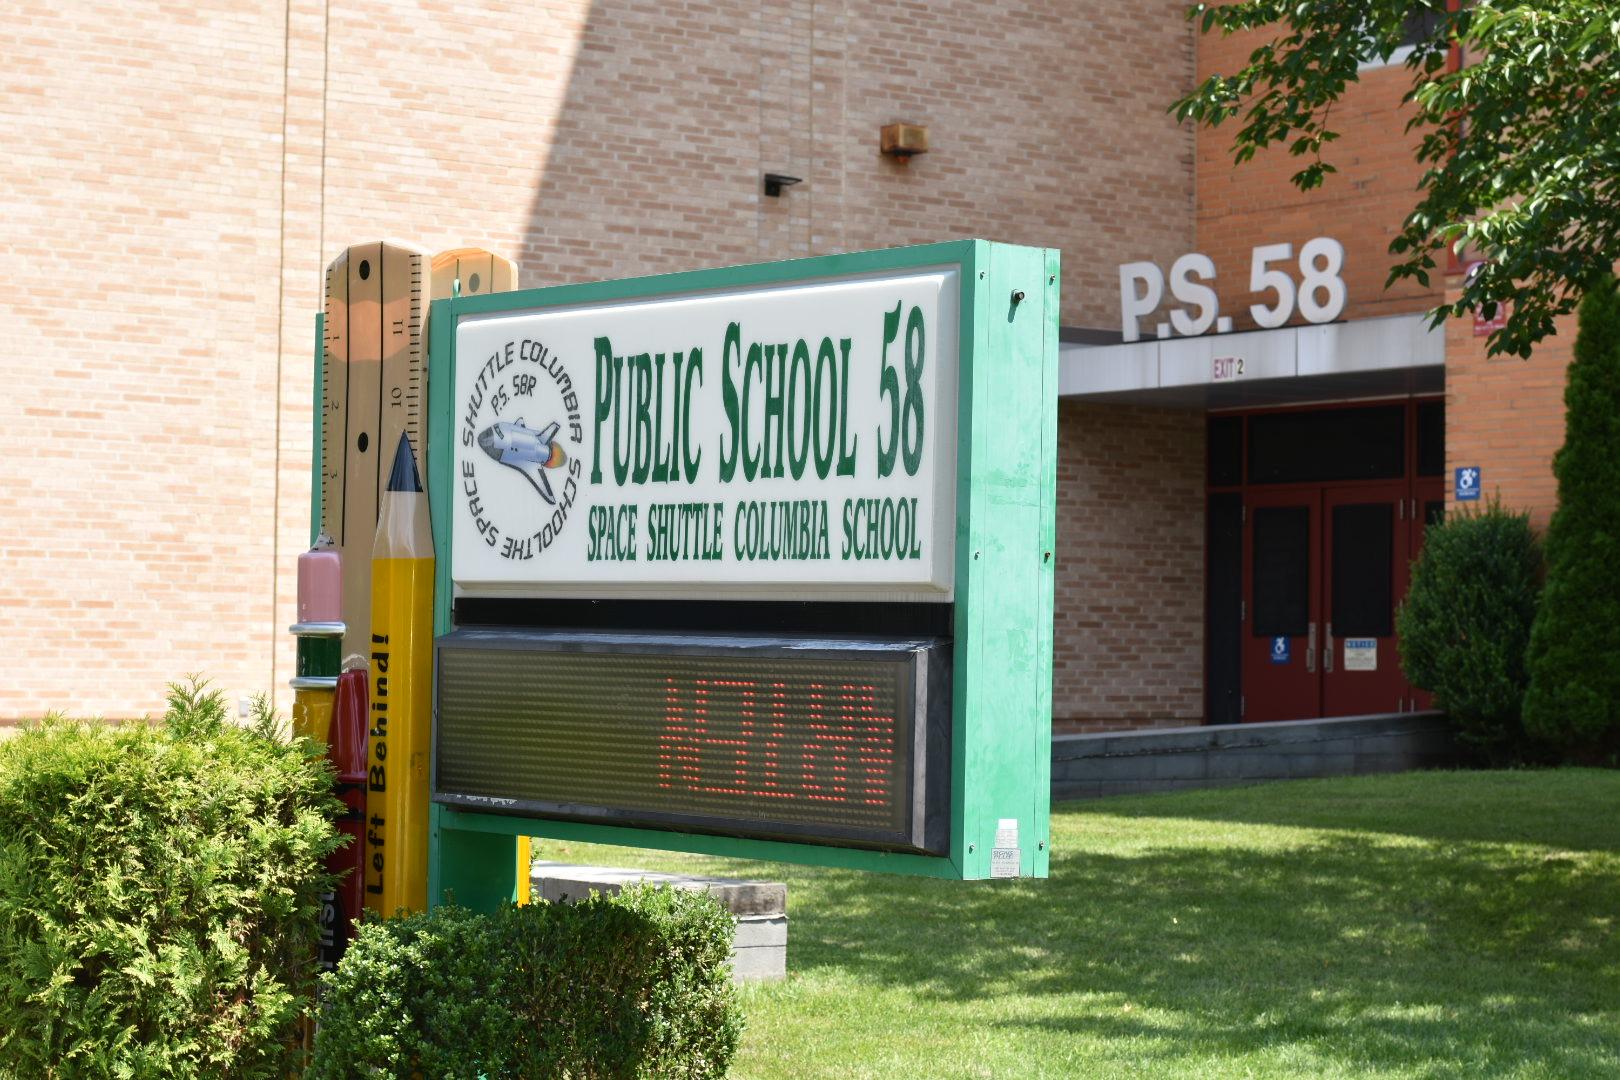 P.S. 58 Building